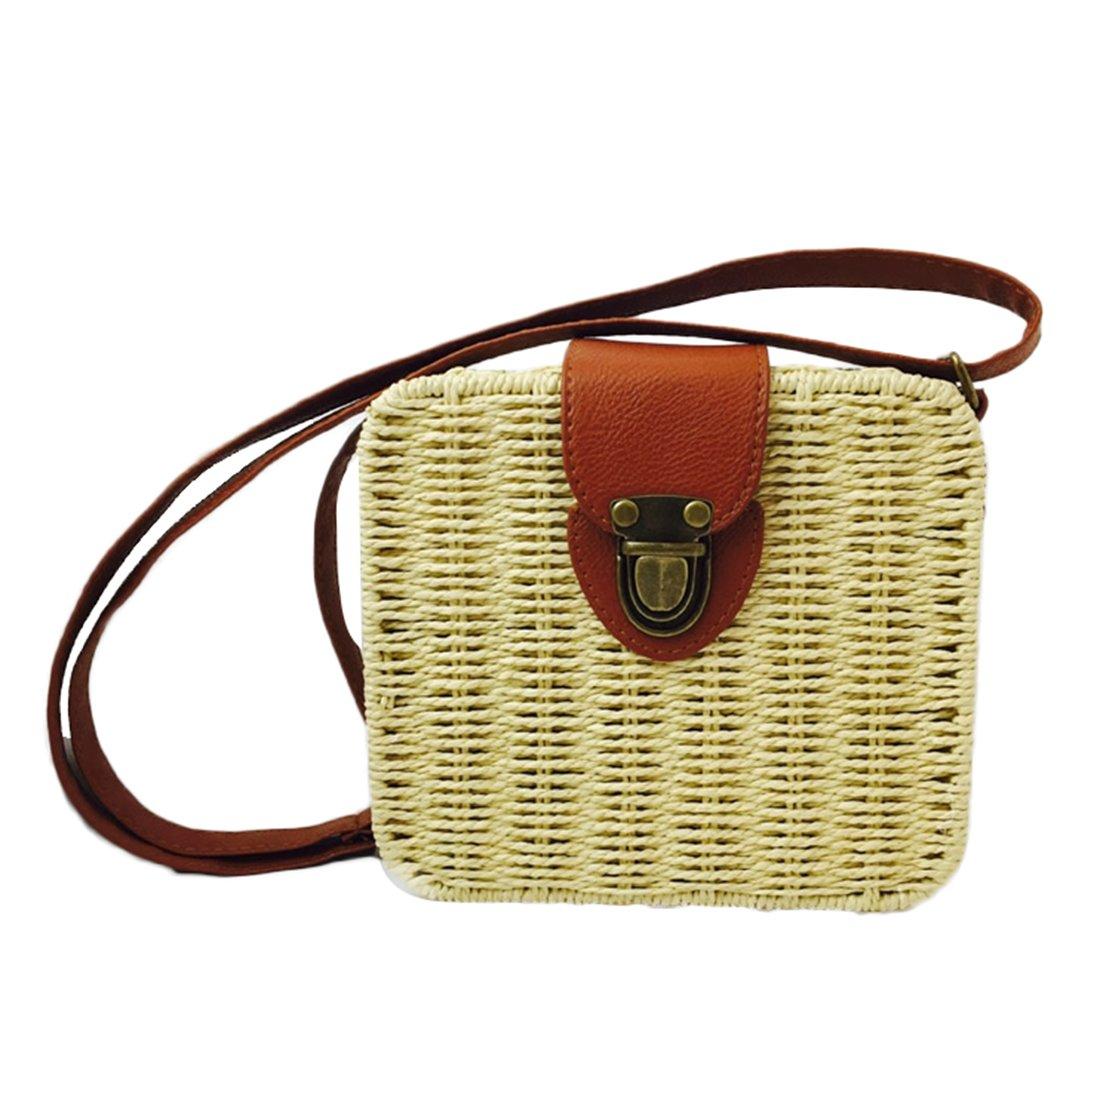 Summer Straw Woven Bag for Women Beach Handbag Crossbody Shoulder Bag Messenger Satchel (Beige)